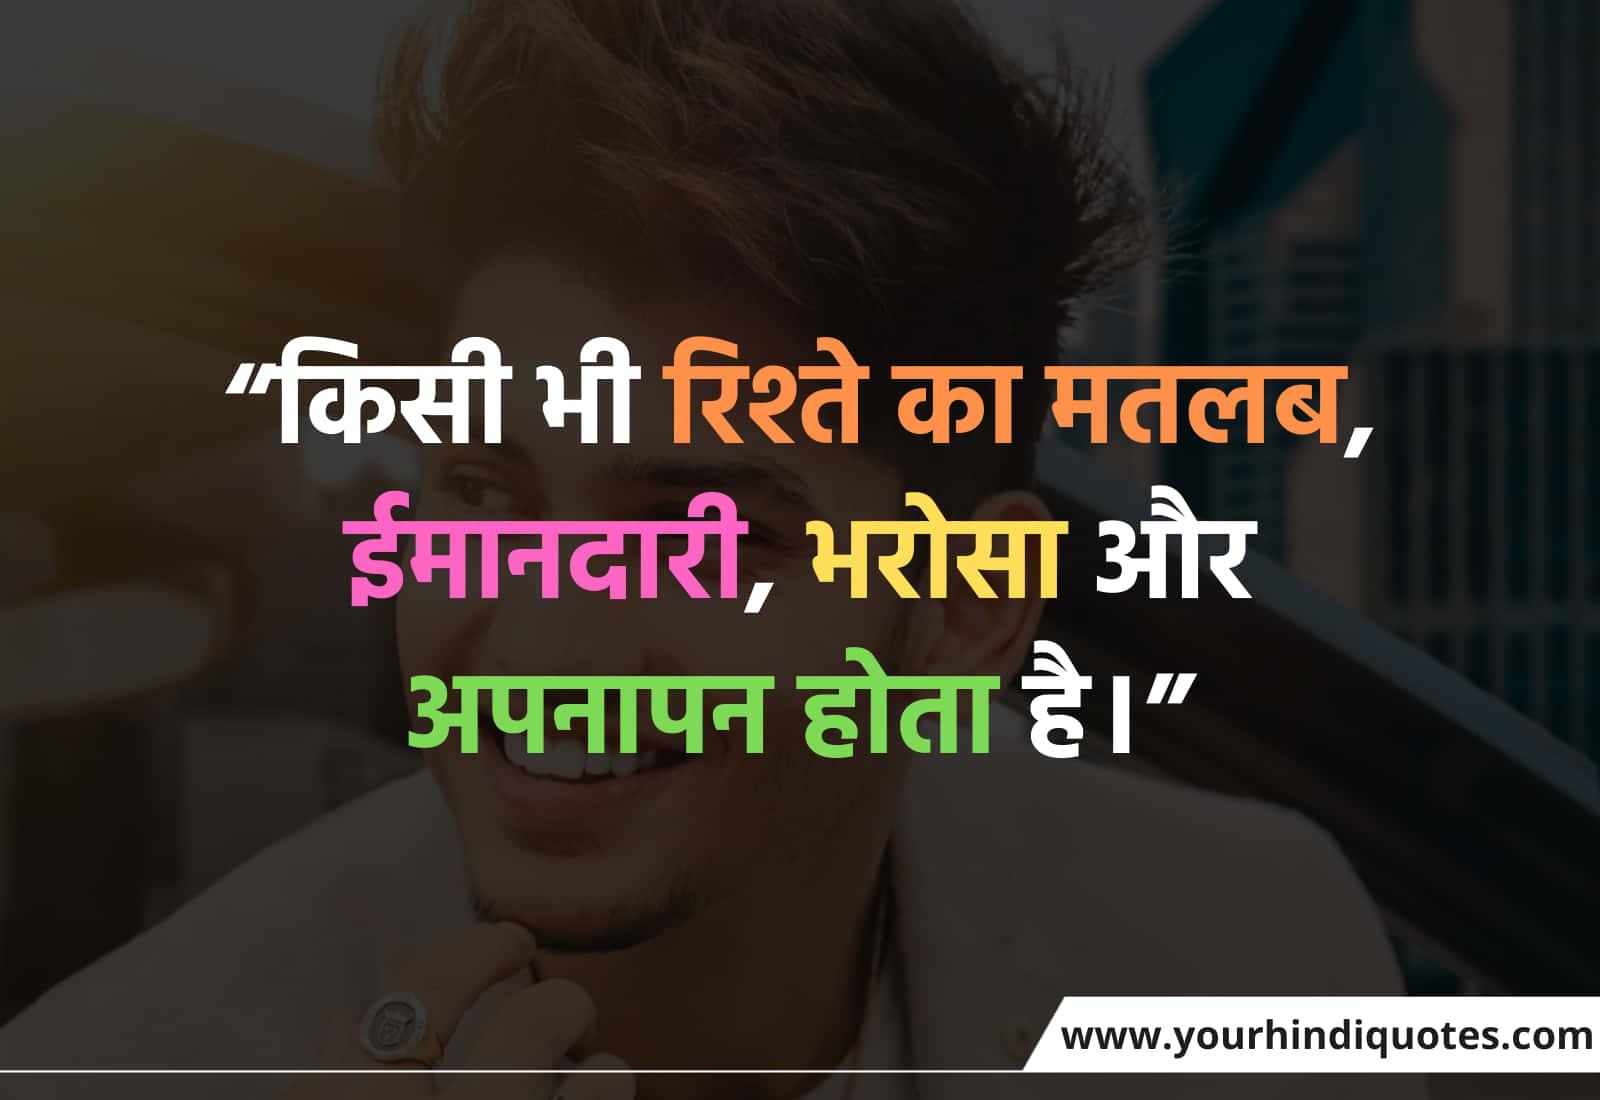 Hindi Thoughts For Good Morning